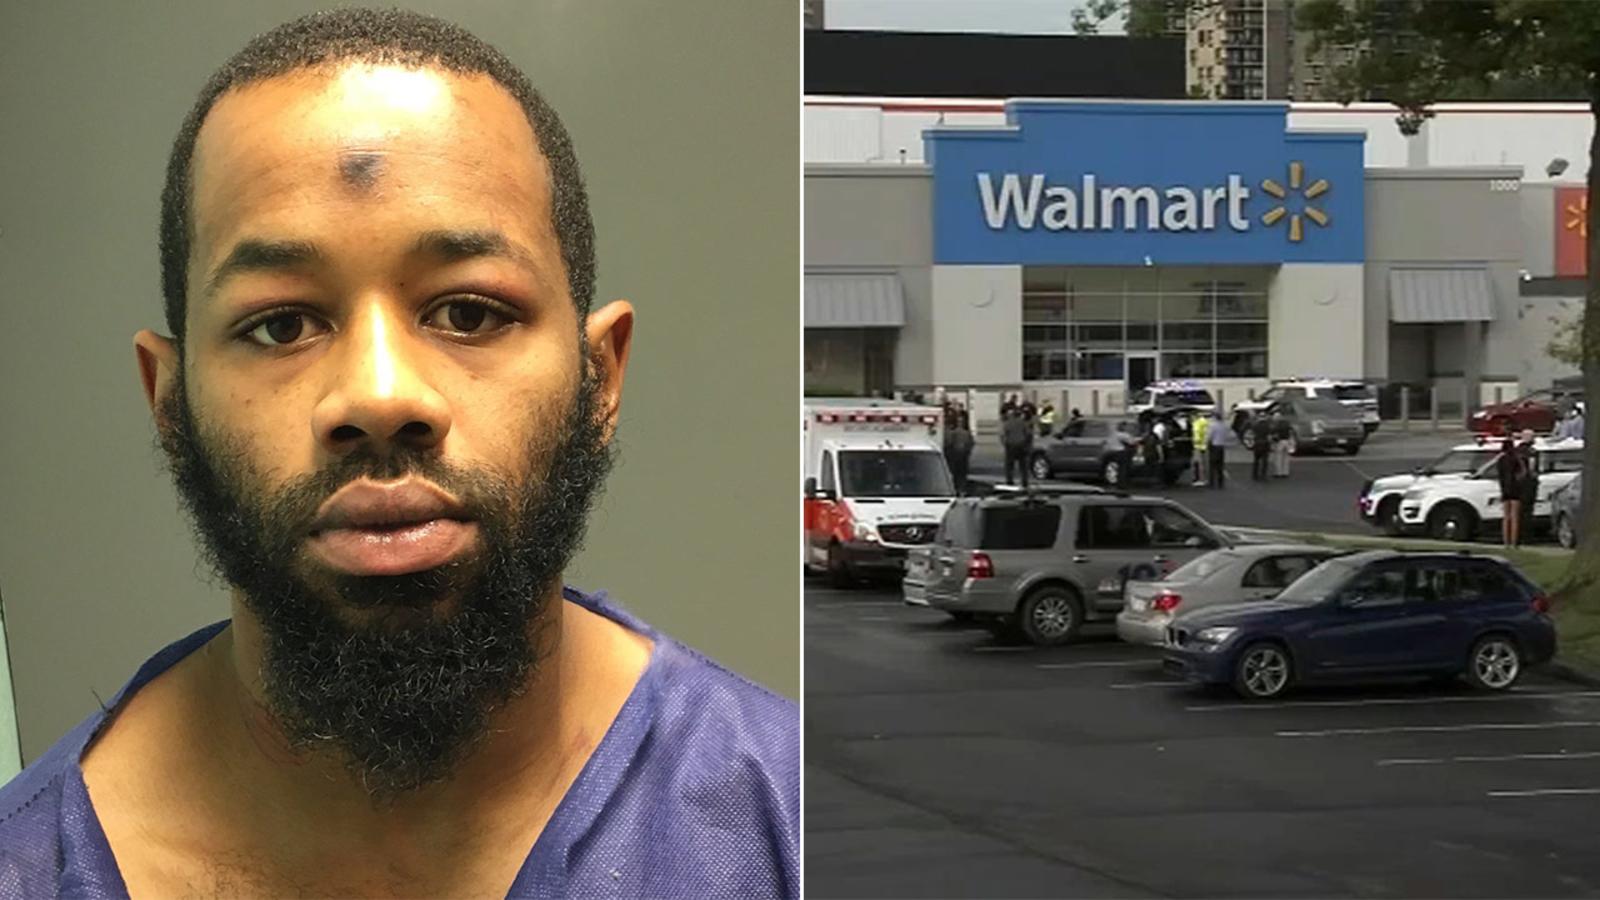 Cheltenham Twp Walmart Shooting Suspect Apologizes Bail Set At 1M